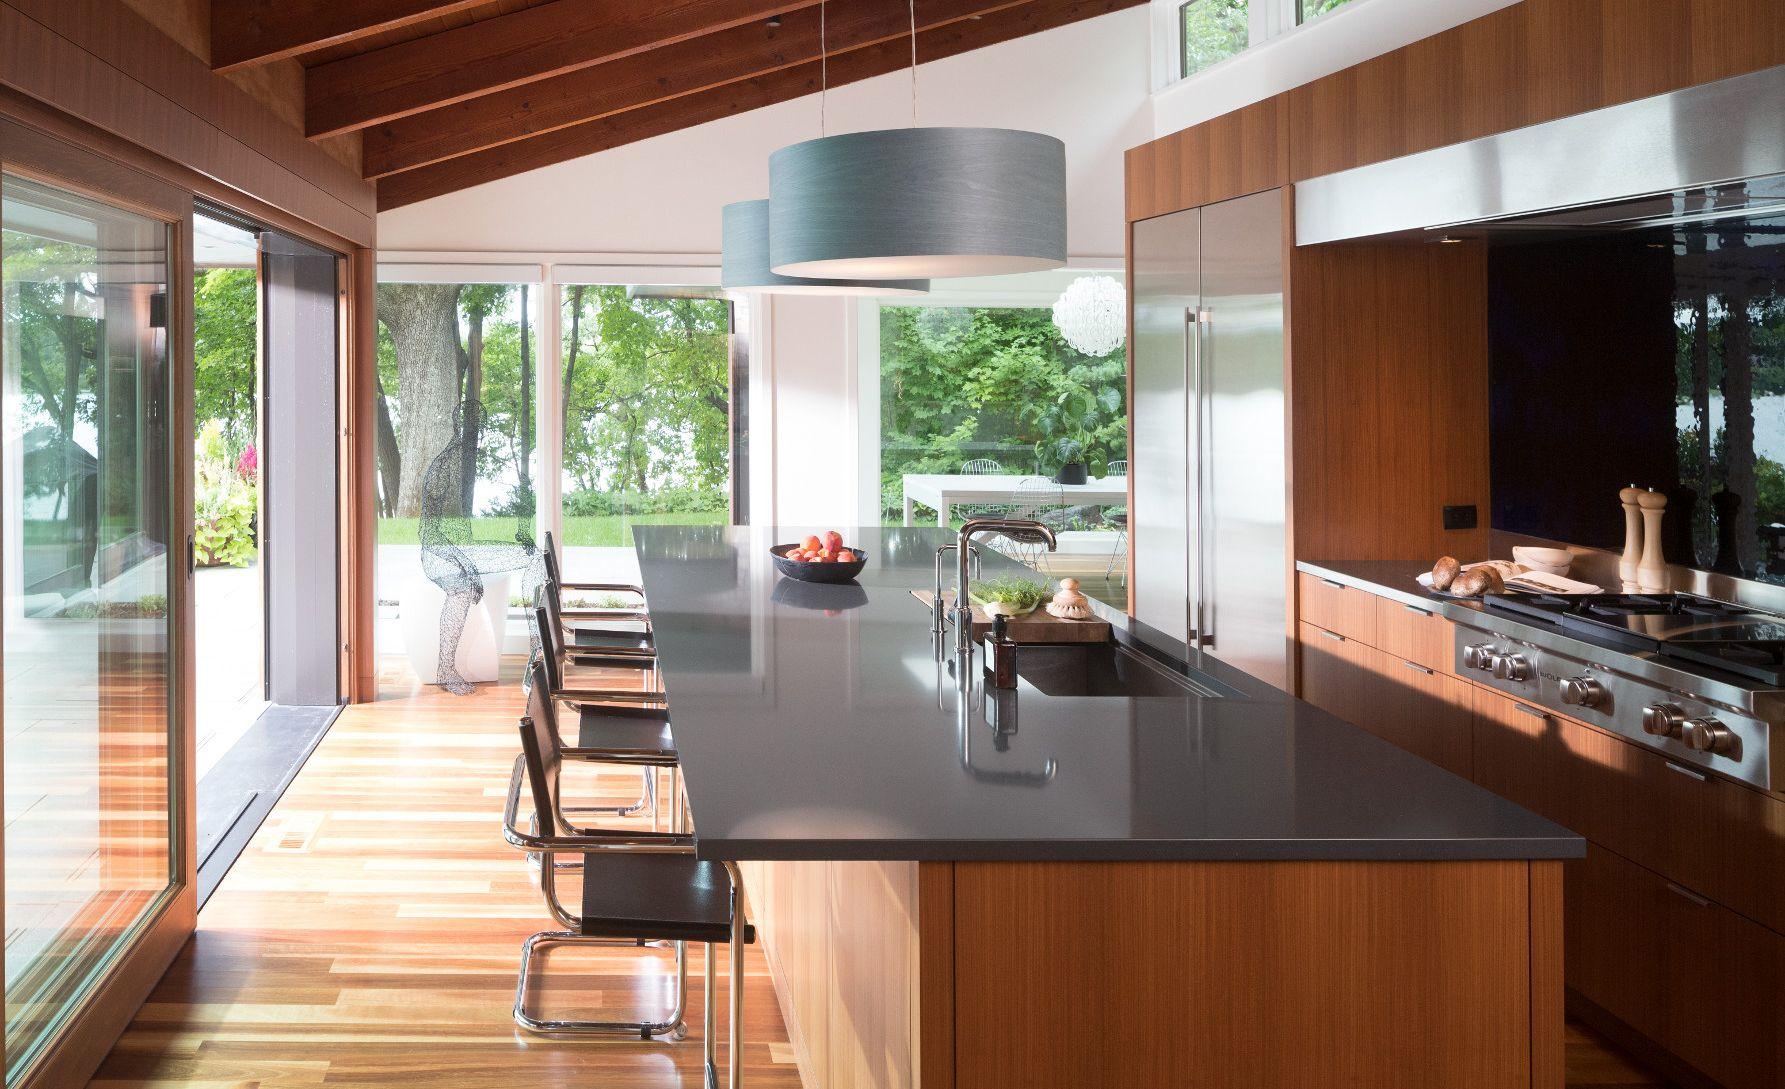 Cambria Fieldstone countertops in a midcentury modern kitchen remodel.